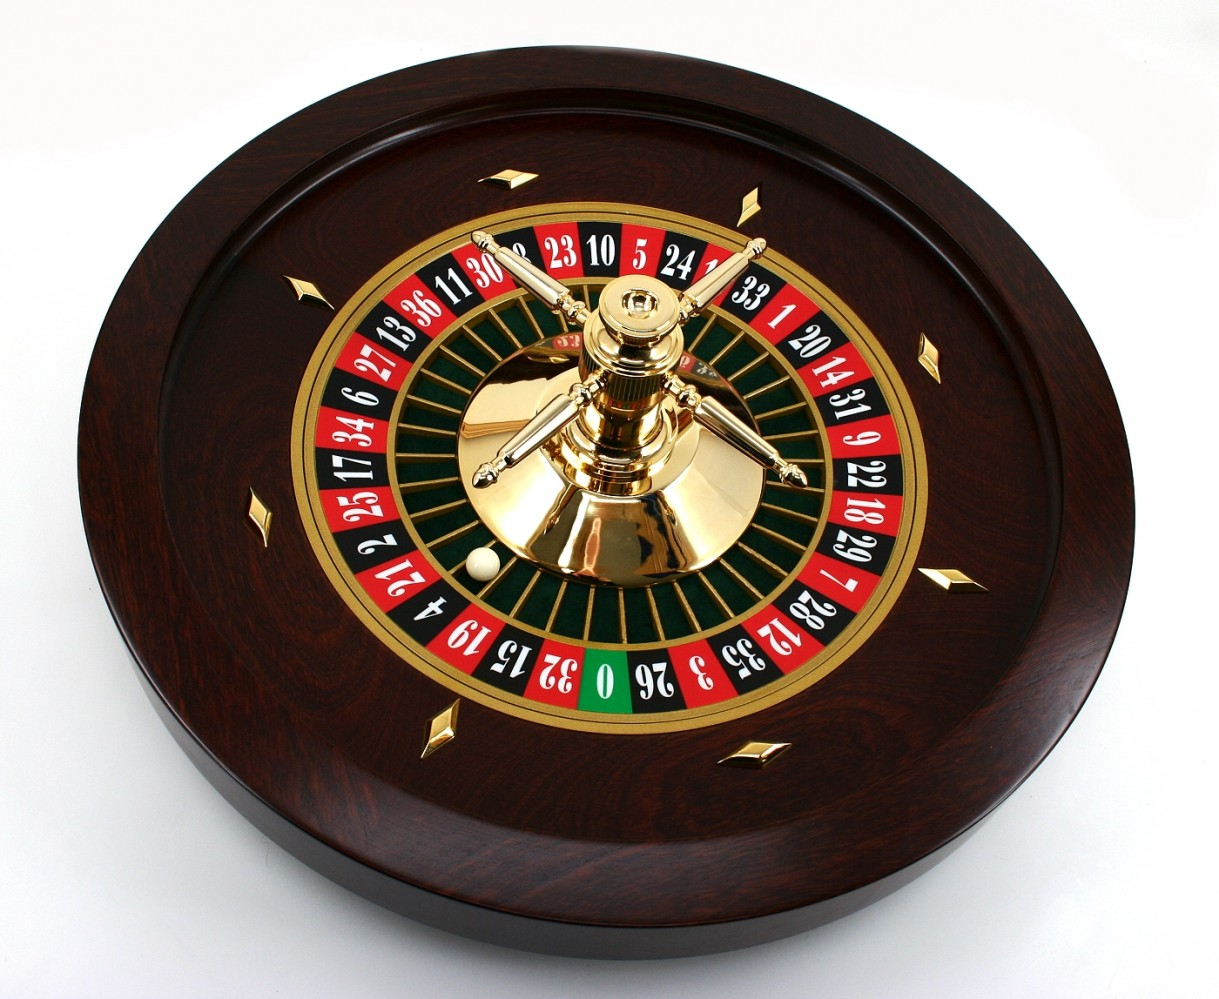 Yale roulette